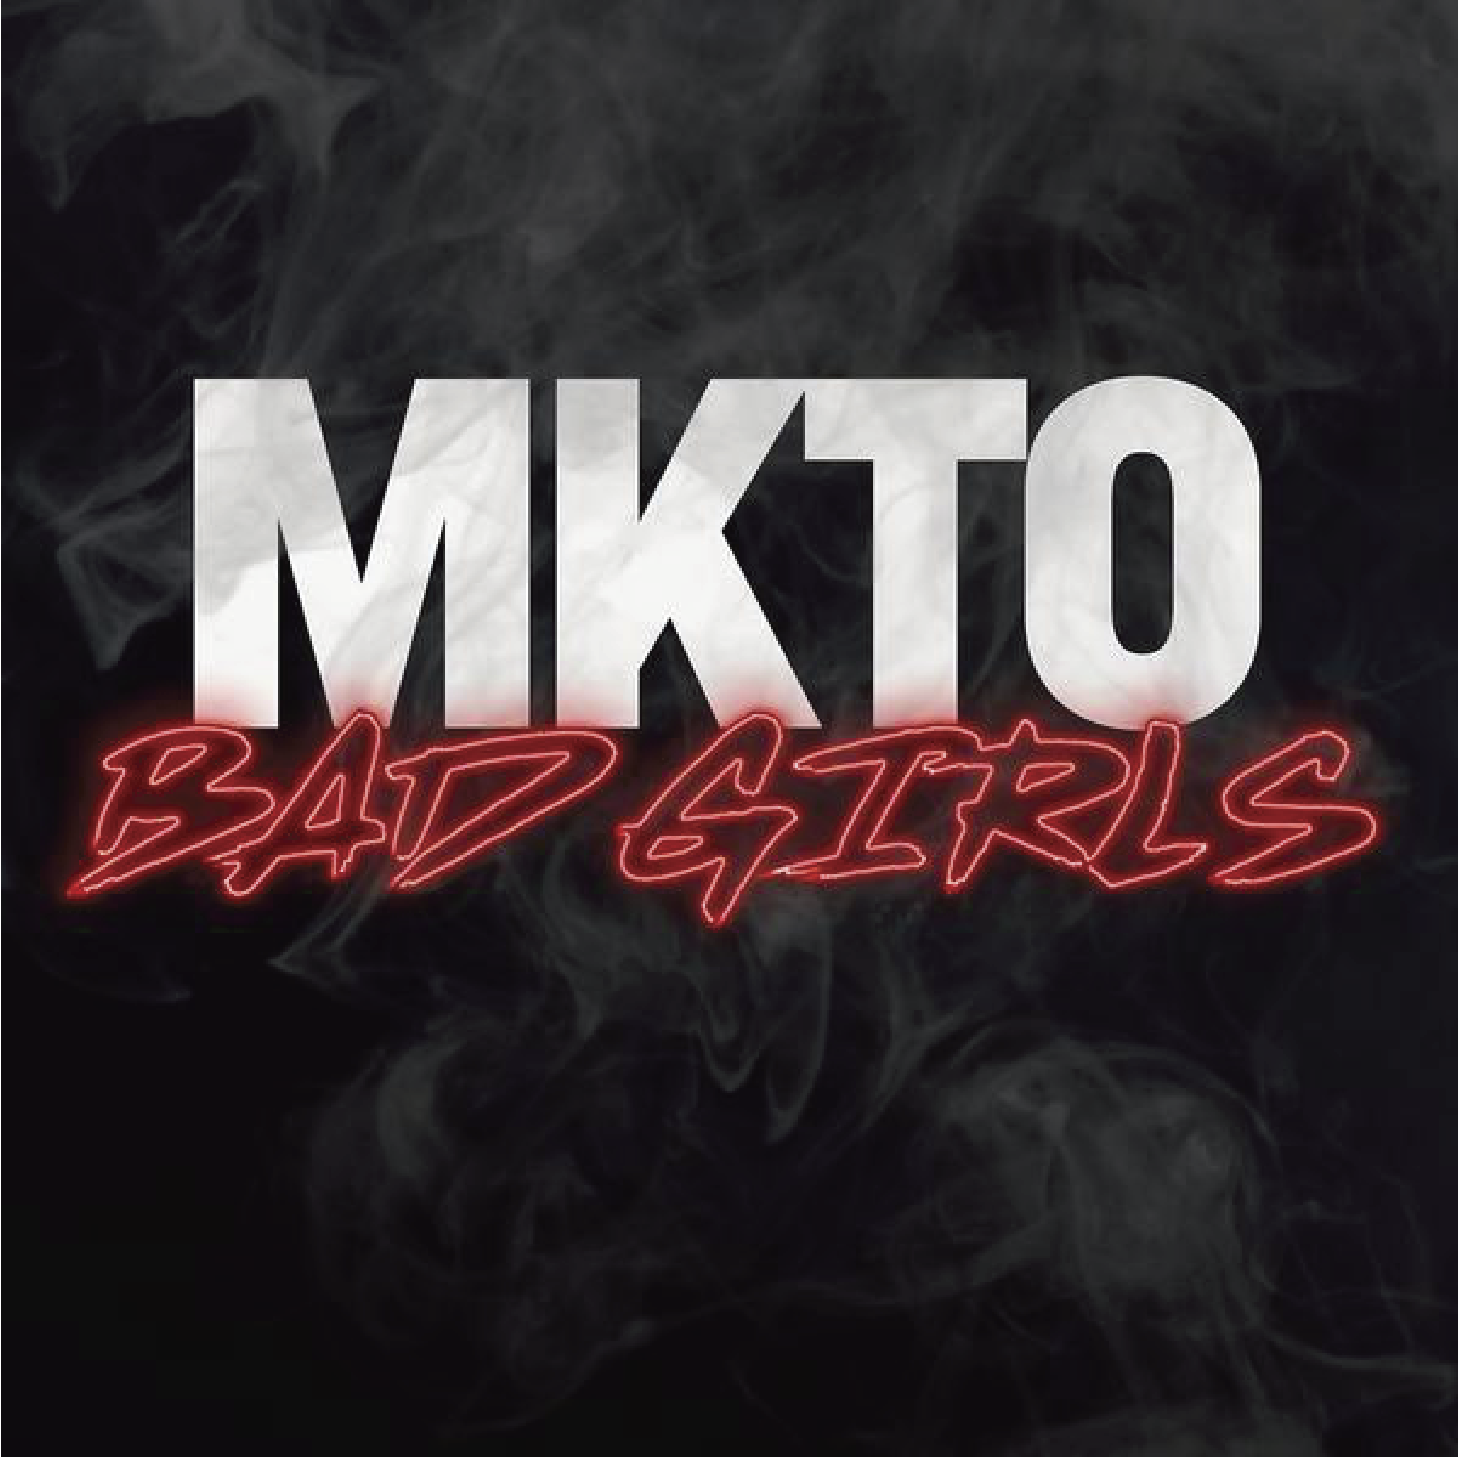 Music Thumbnails 1916_MKTO - Bad Girls.png